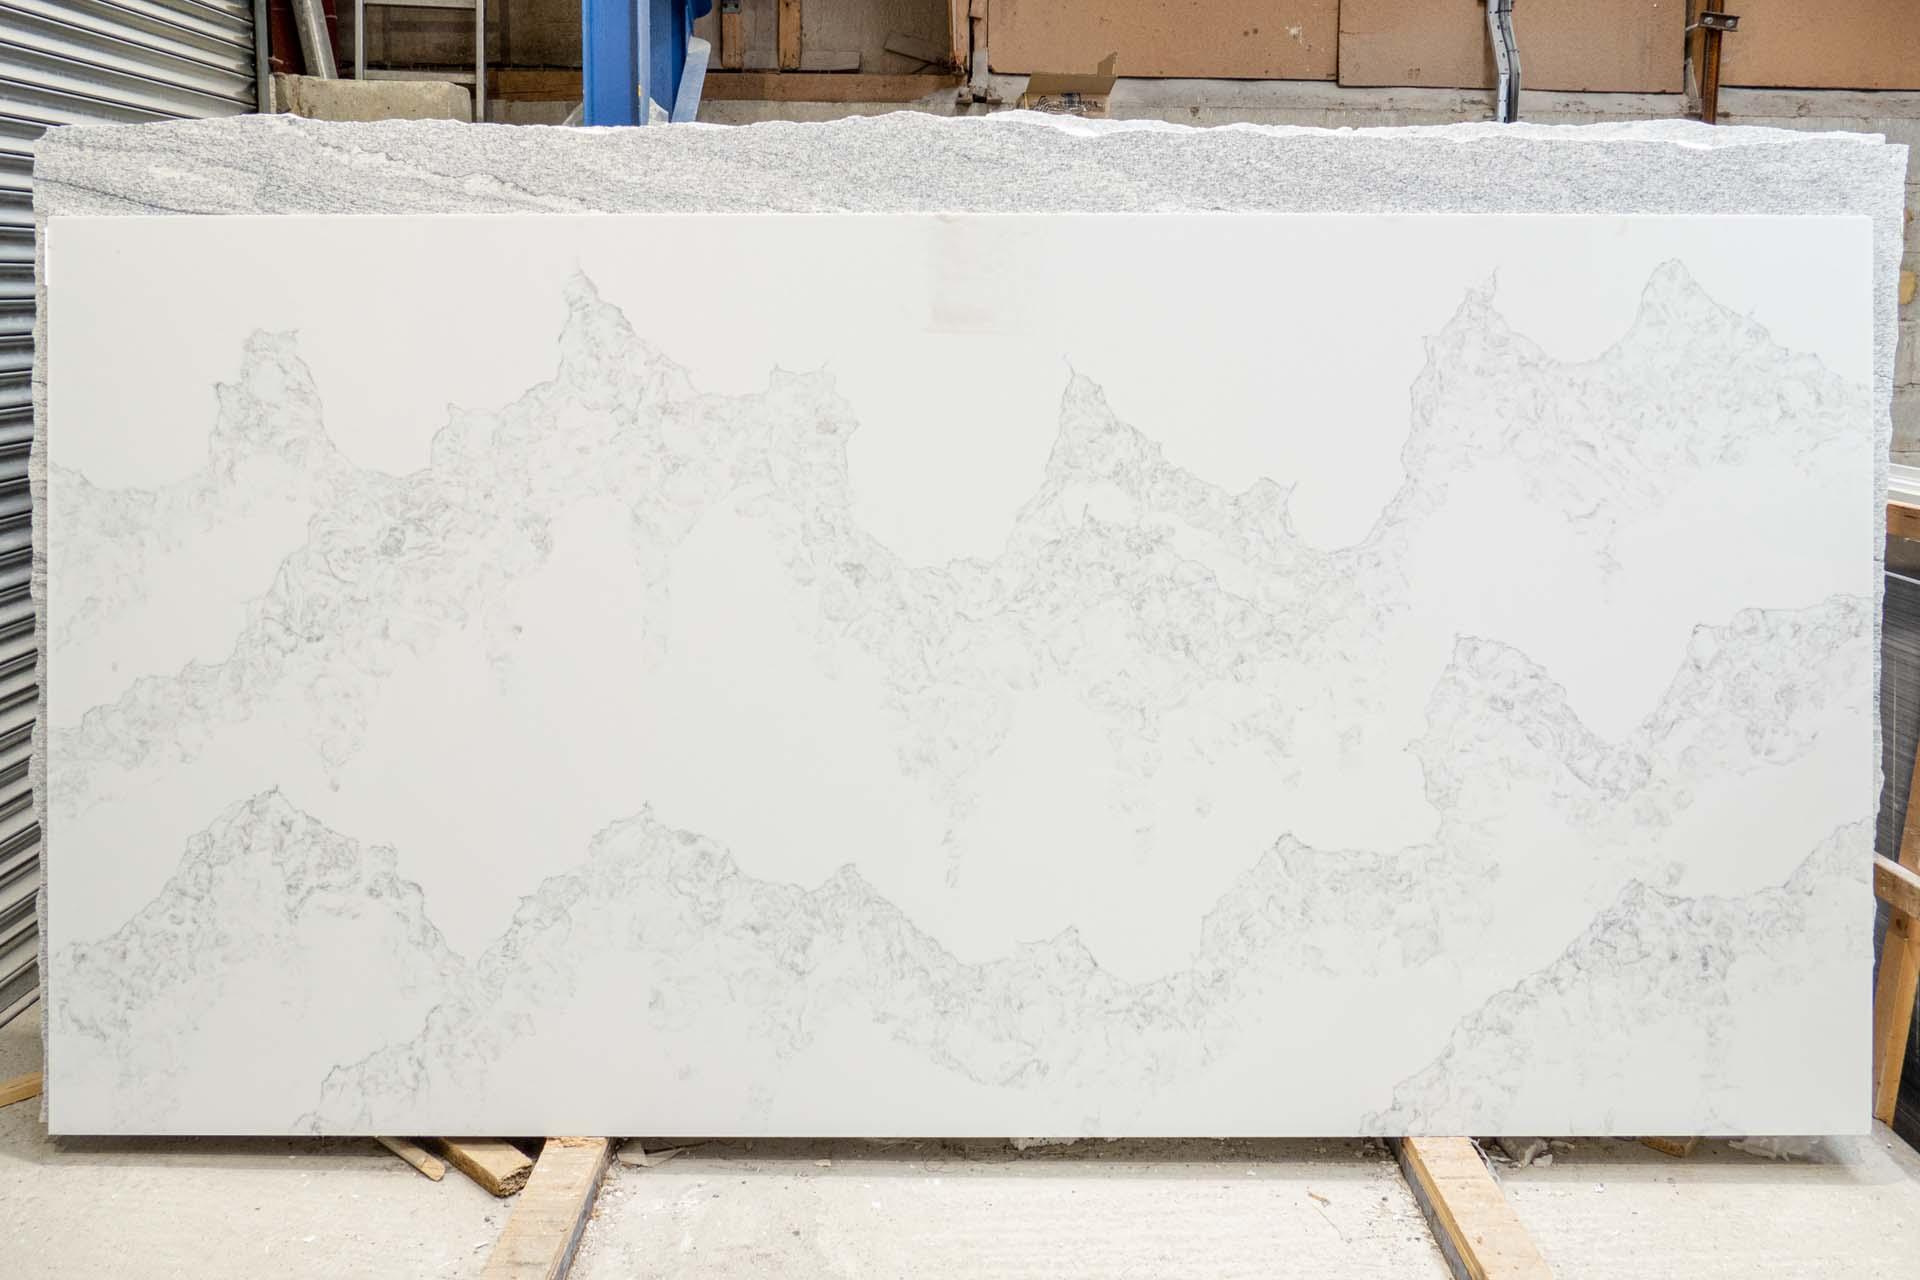 bloomstone everest quartz worktops bs190521 35664 152653a